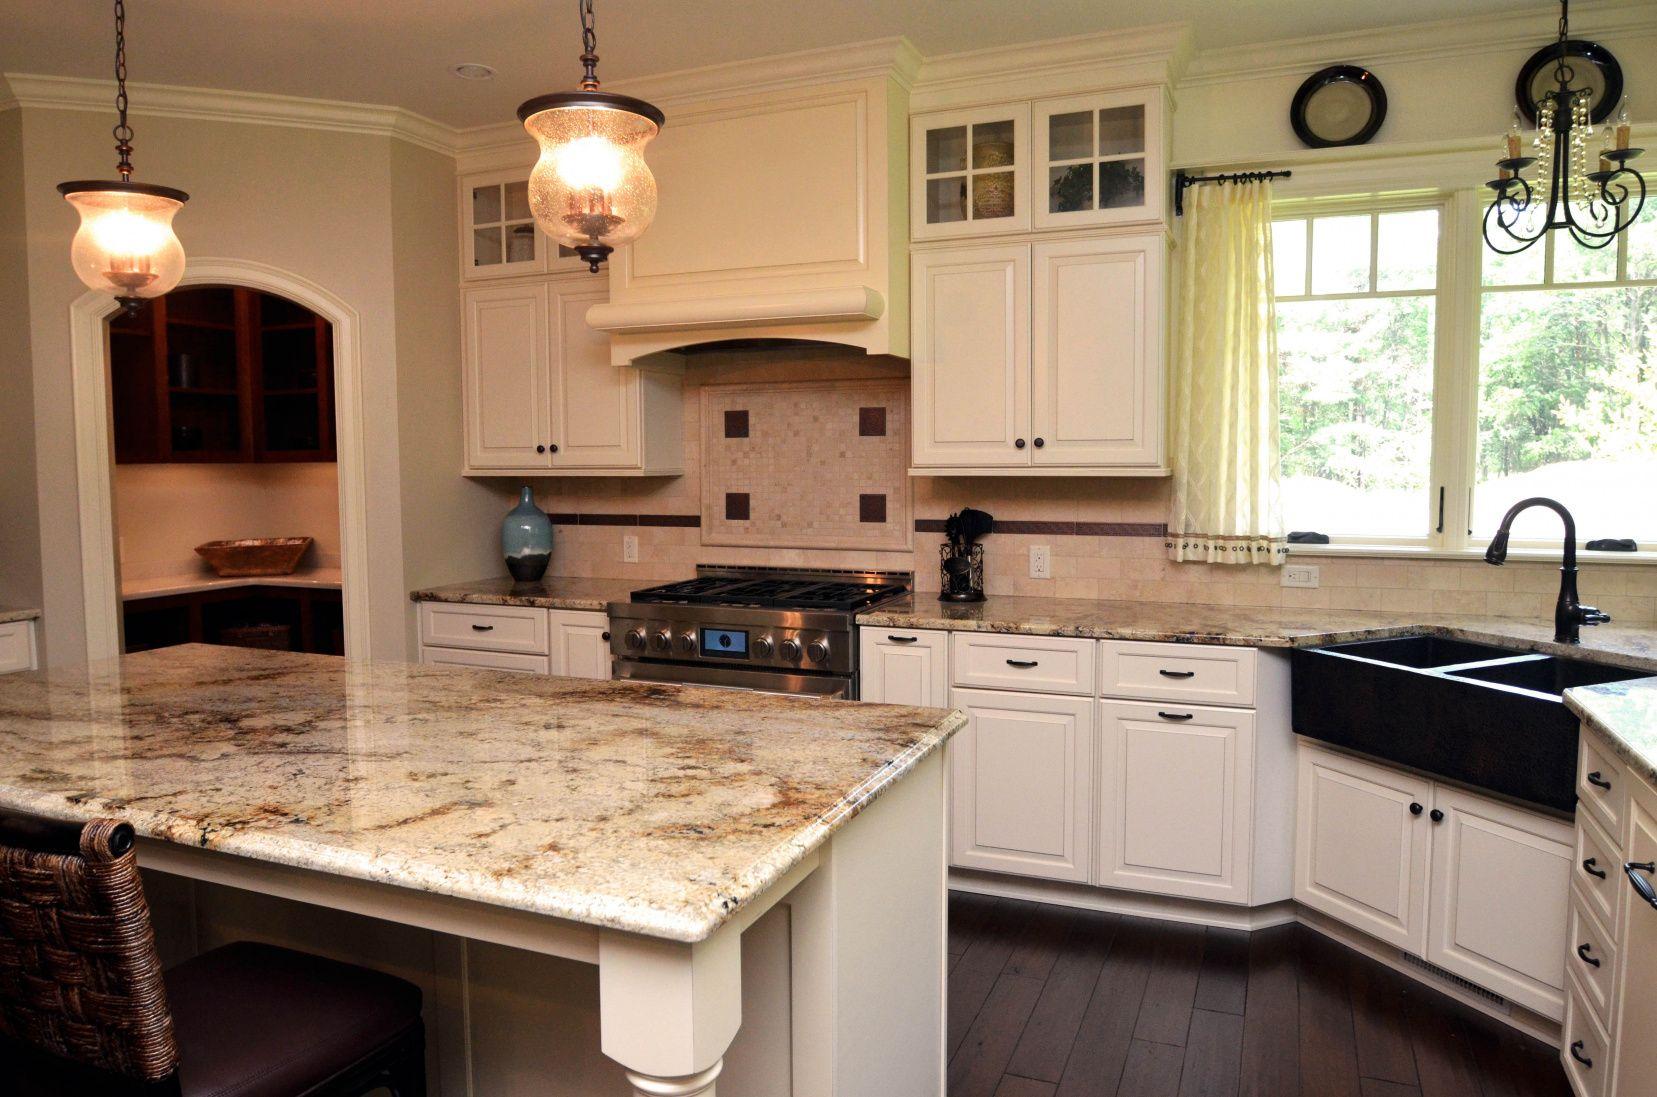 70 Granite Countertops Buffalo Ny Chalkboard Ideas For Kitchen Check More At Http Matting Countertops Kitchen Cabinets And Countertops Granite Countertops